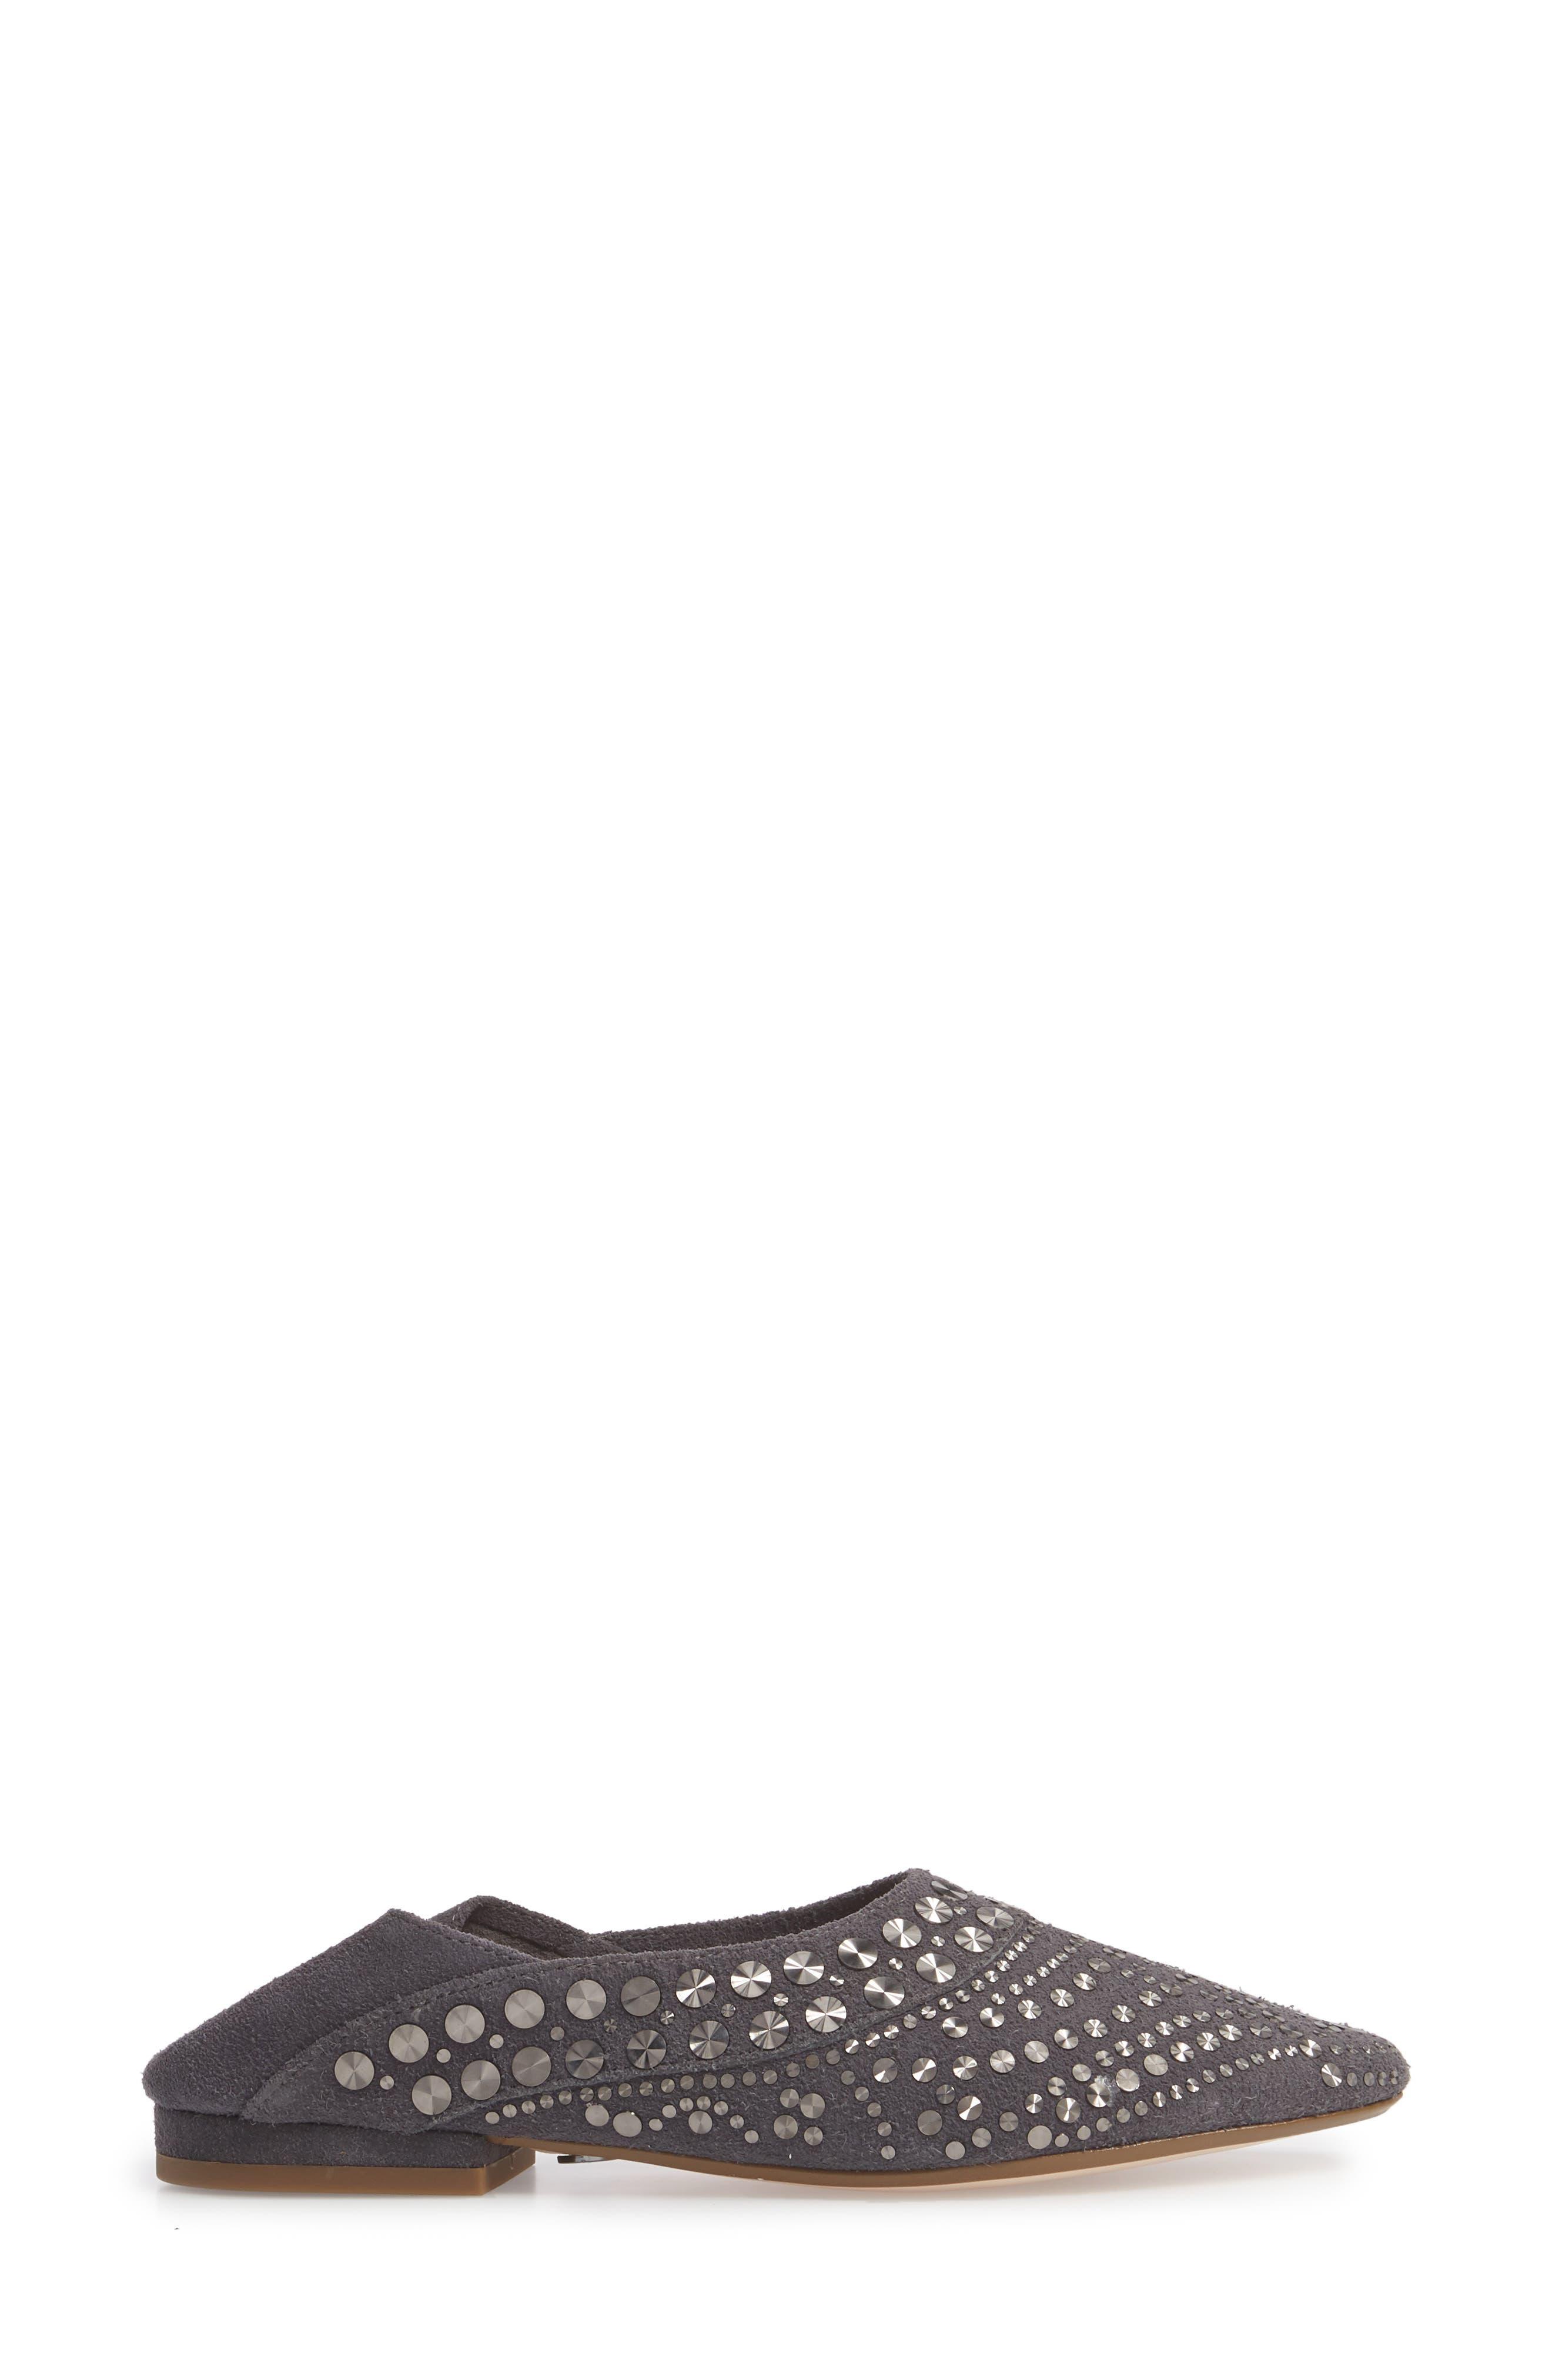 Cecelia New York Mojito Convertible Studded Flat MgSgAz